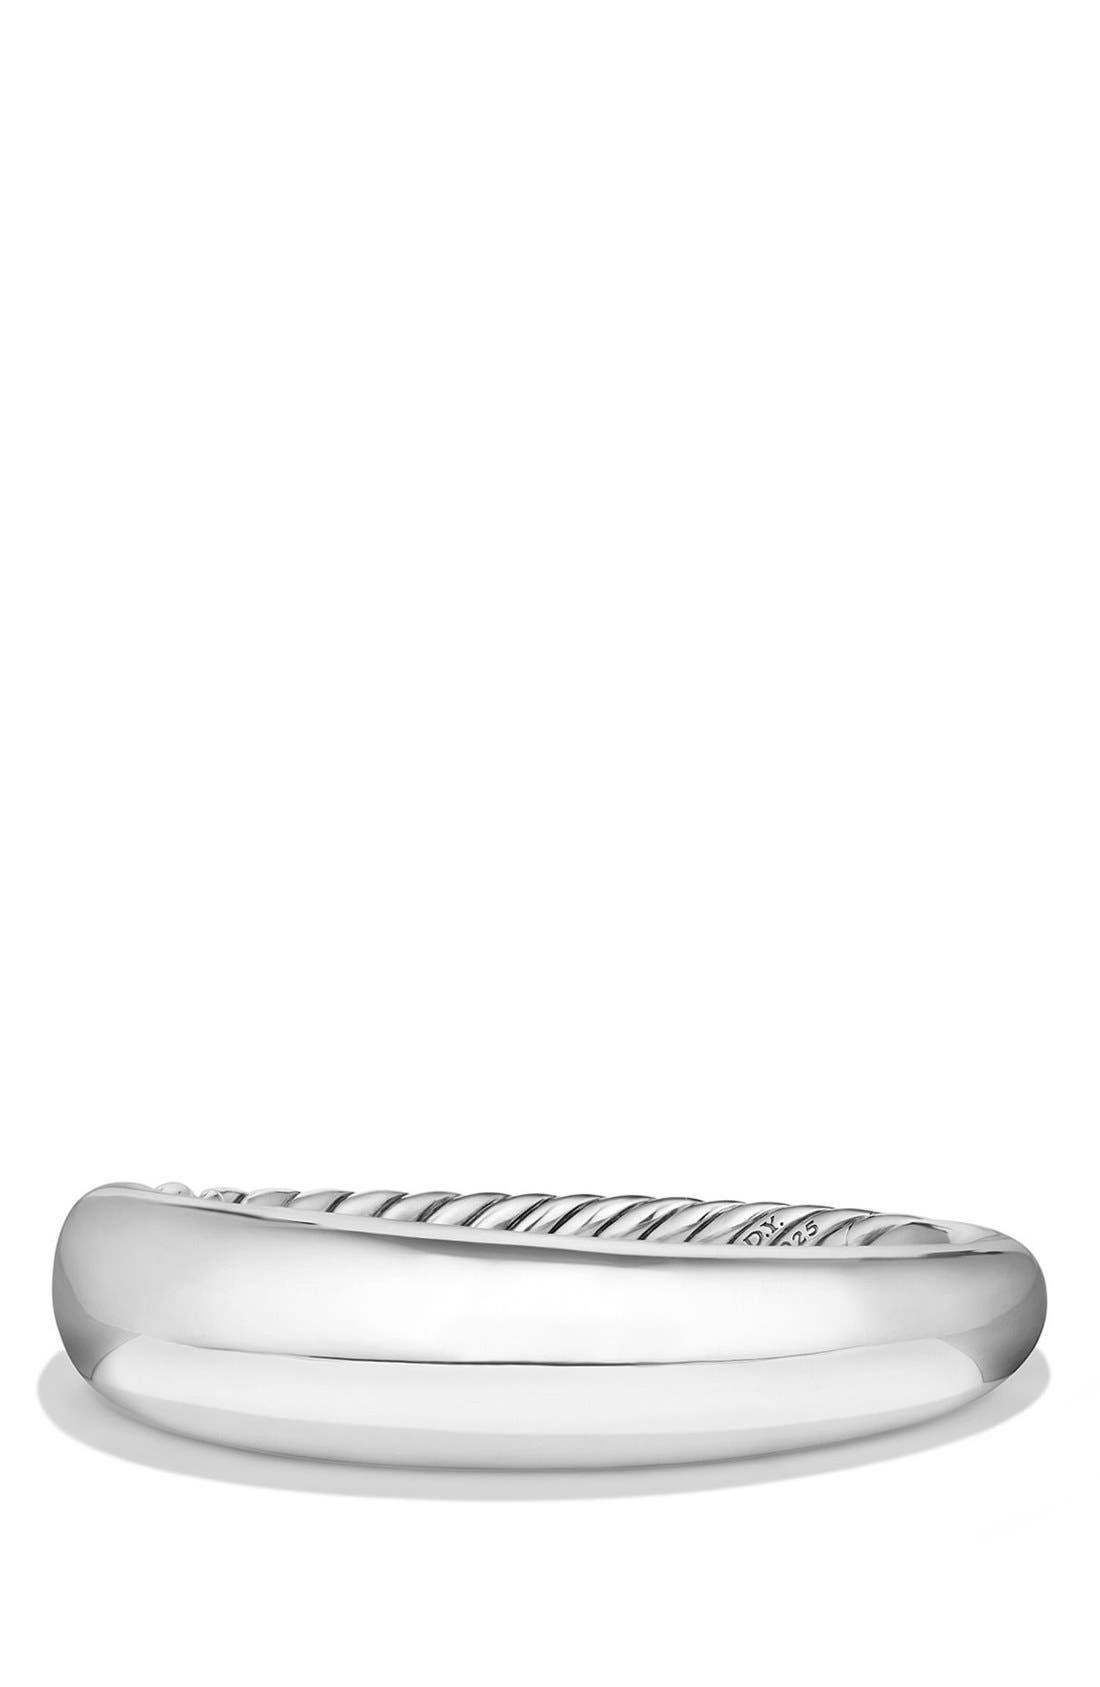 David Yurman 'Pure Form' Large Sterling Silver Bracelet